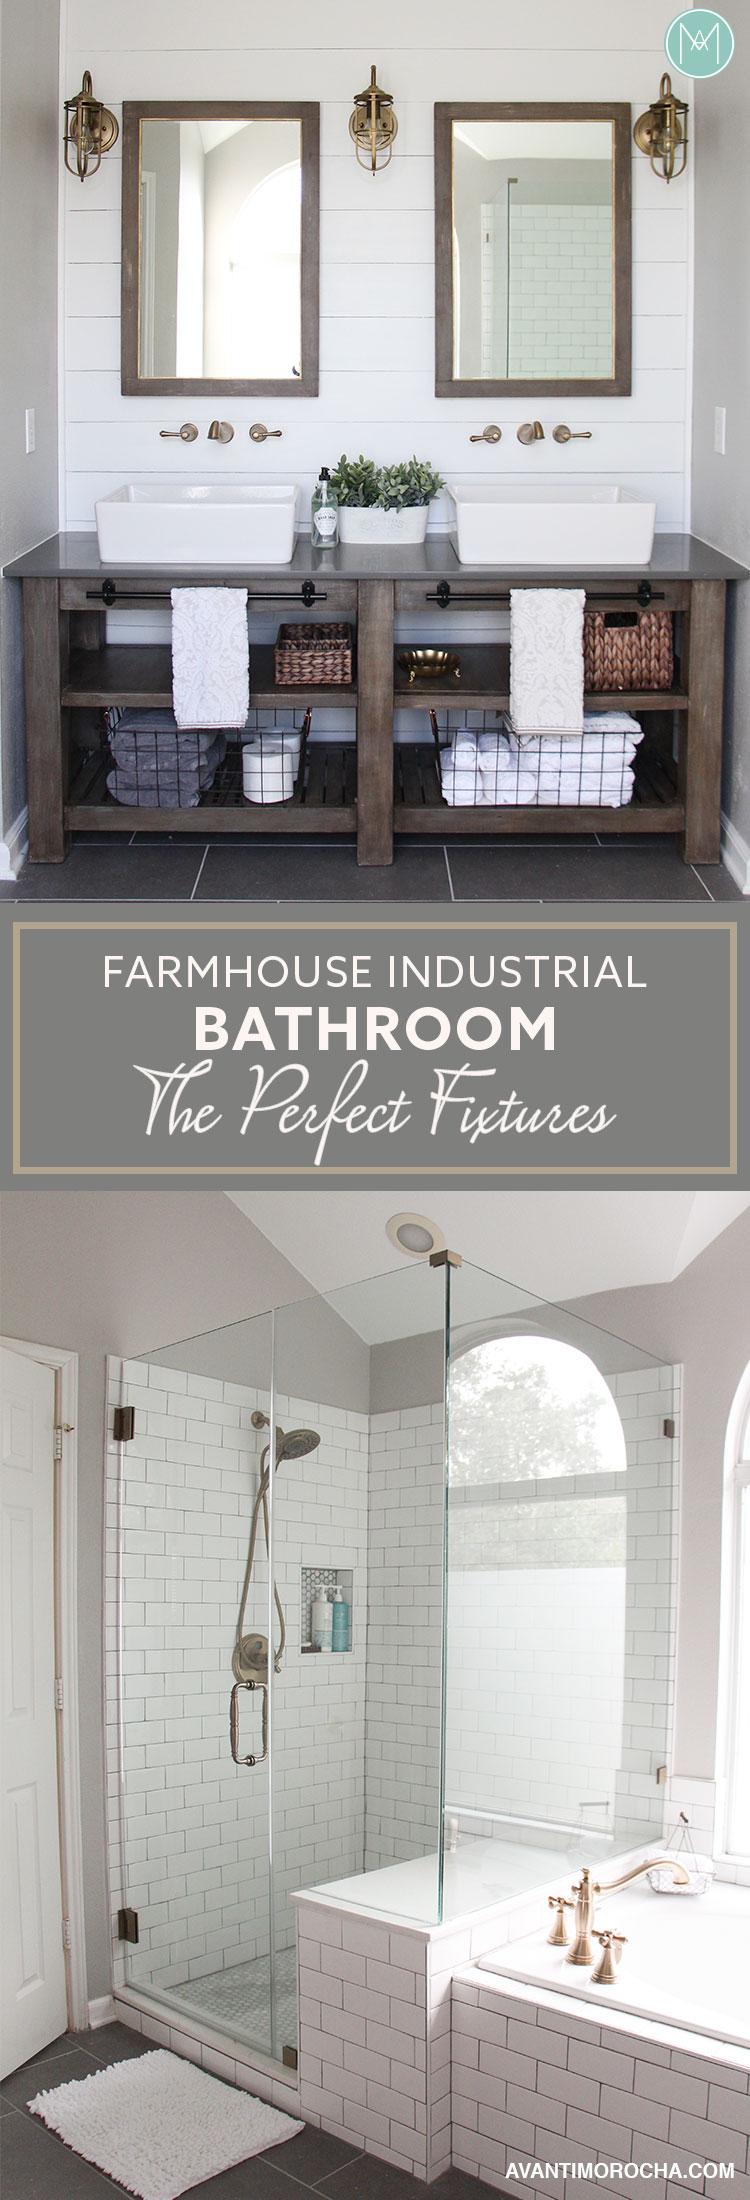 Master Bathroom Que Significa industrial farmhouse bathroom - the perfect fixtures - avanti morocha